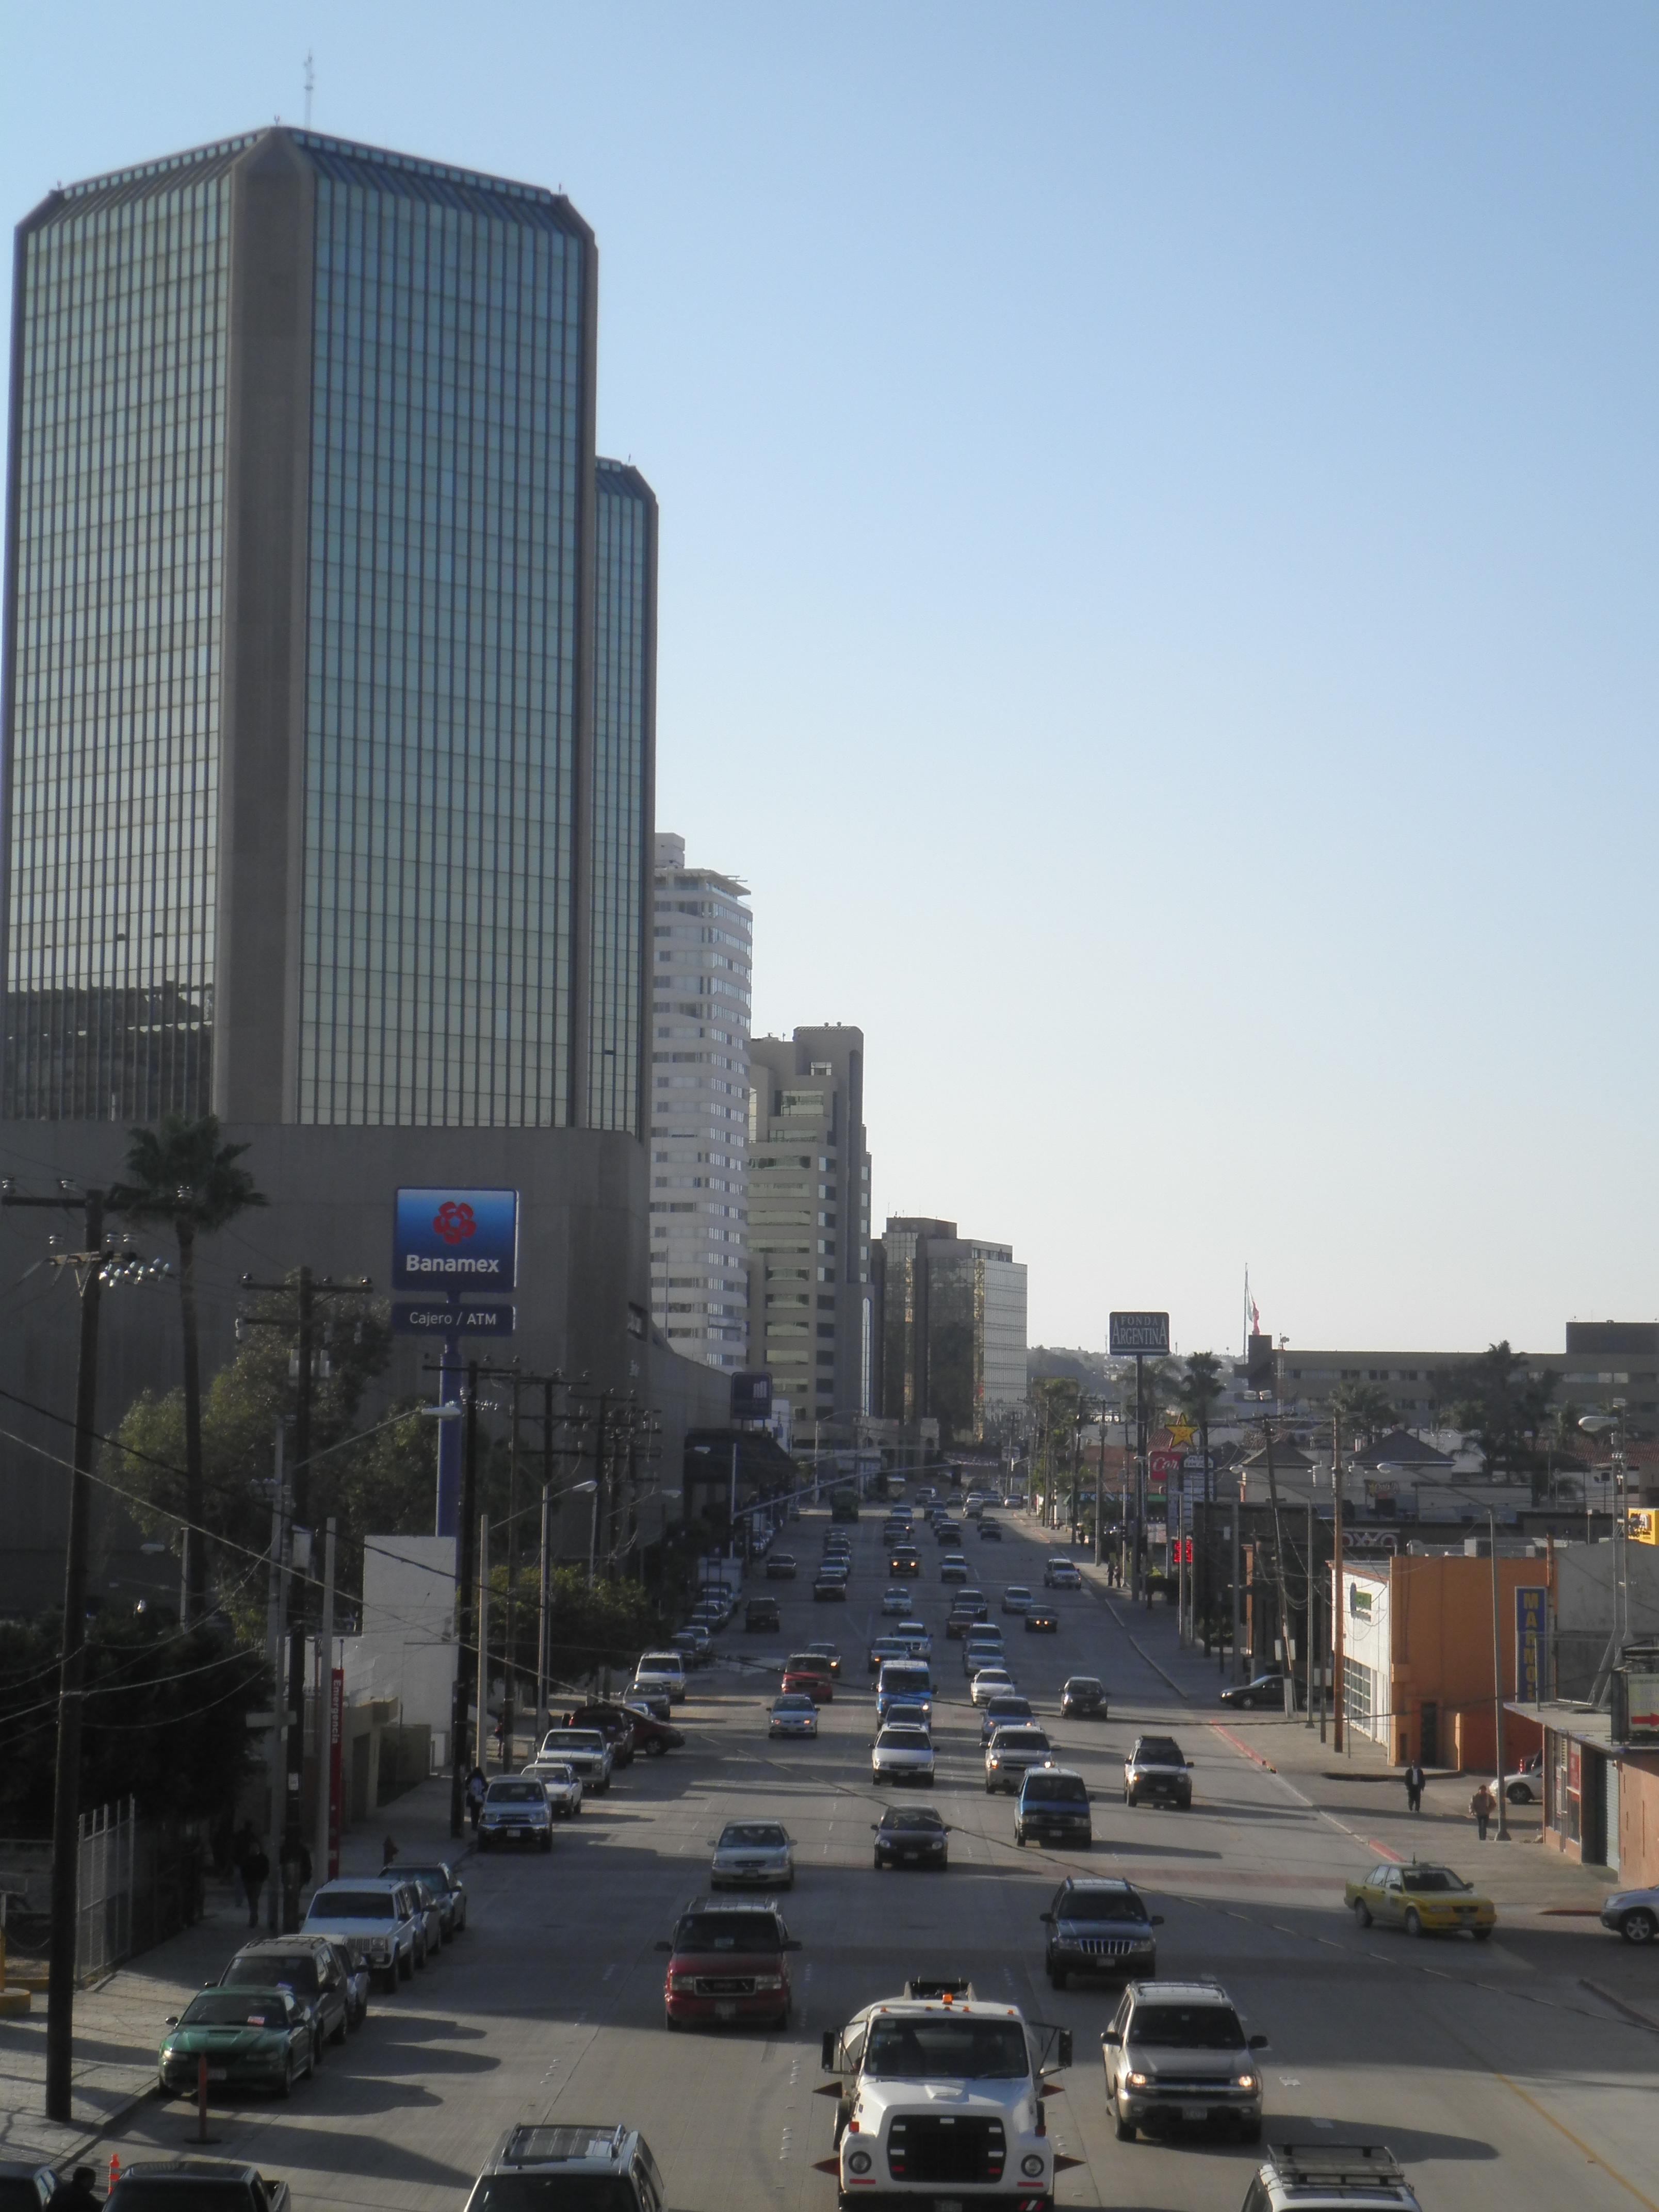 Tijuana ciudad donde se crio Julieta Venegas.